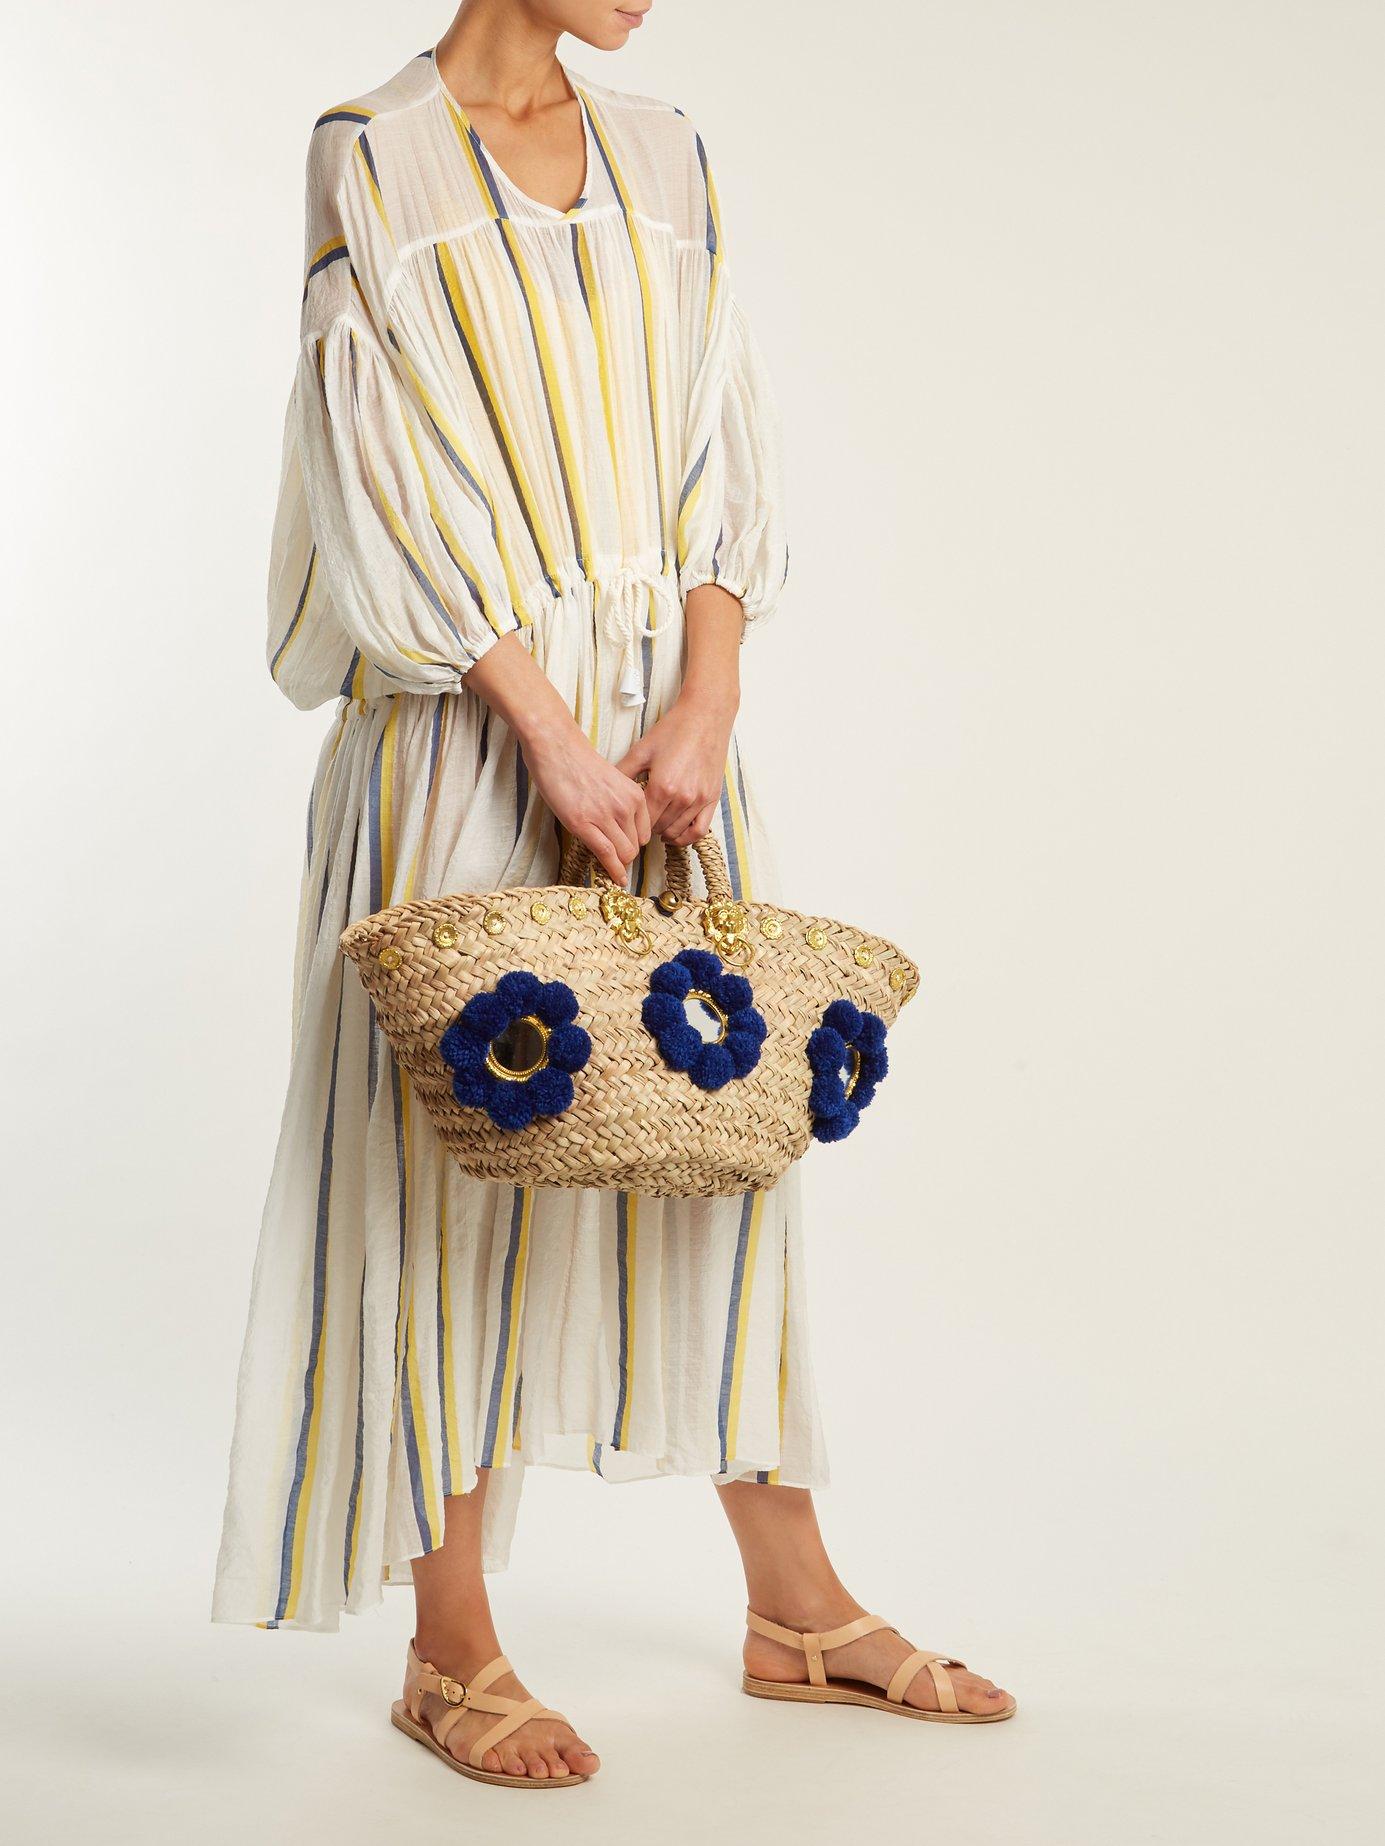 Dropped shoulder striped cotton dress by Love Binetti